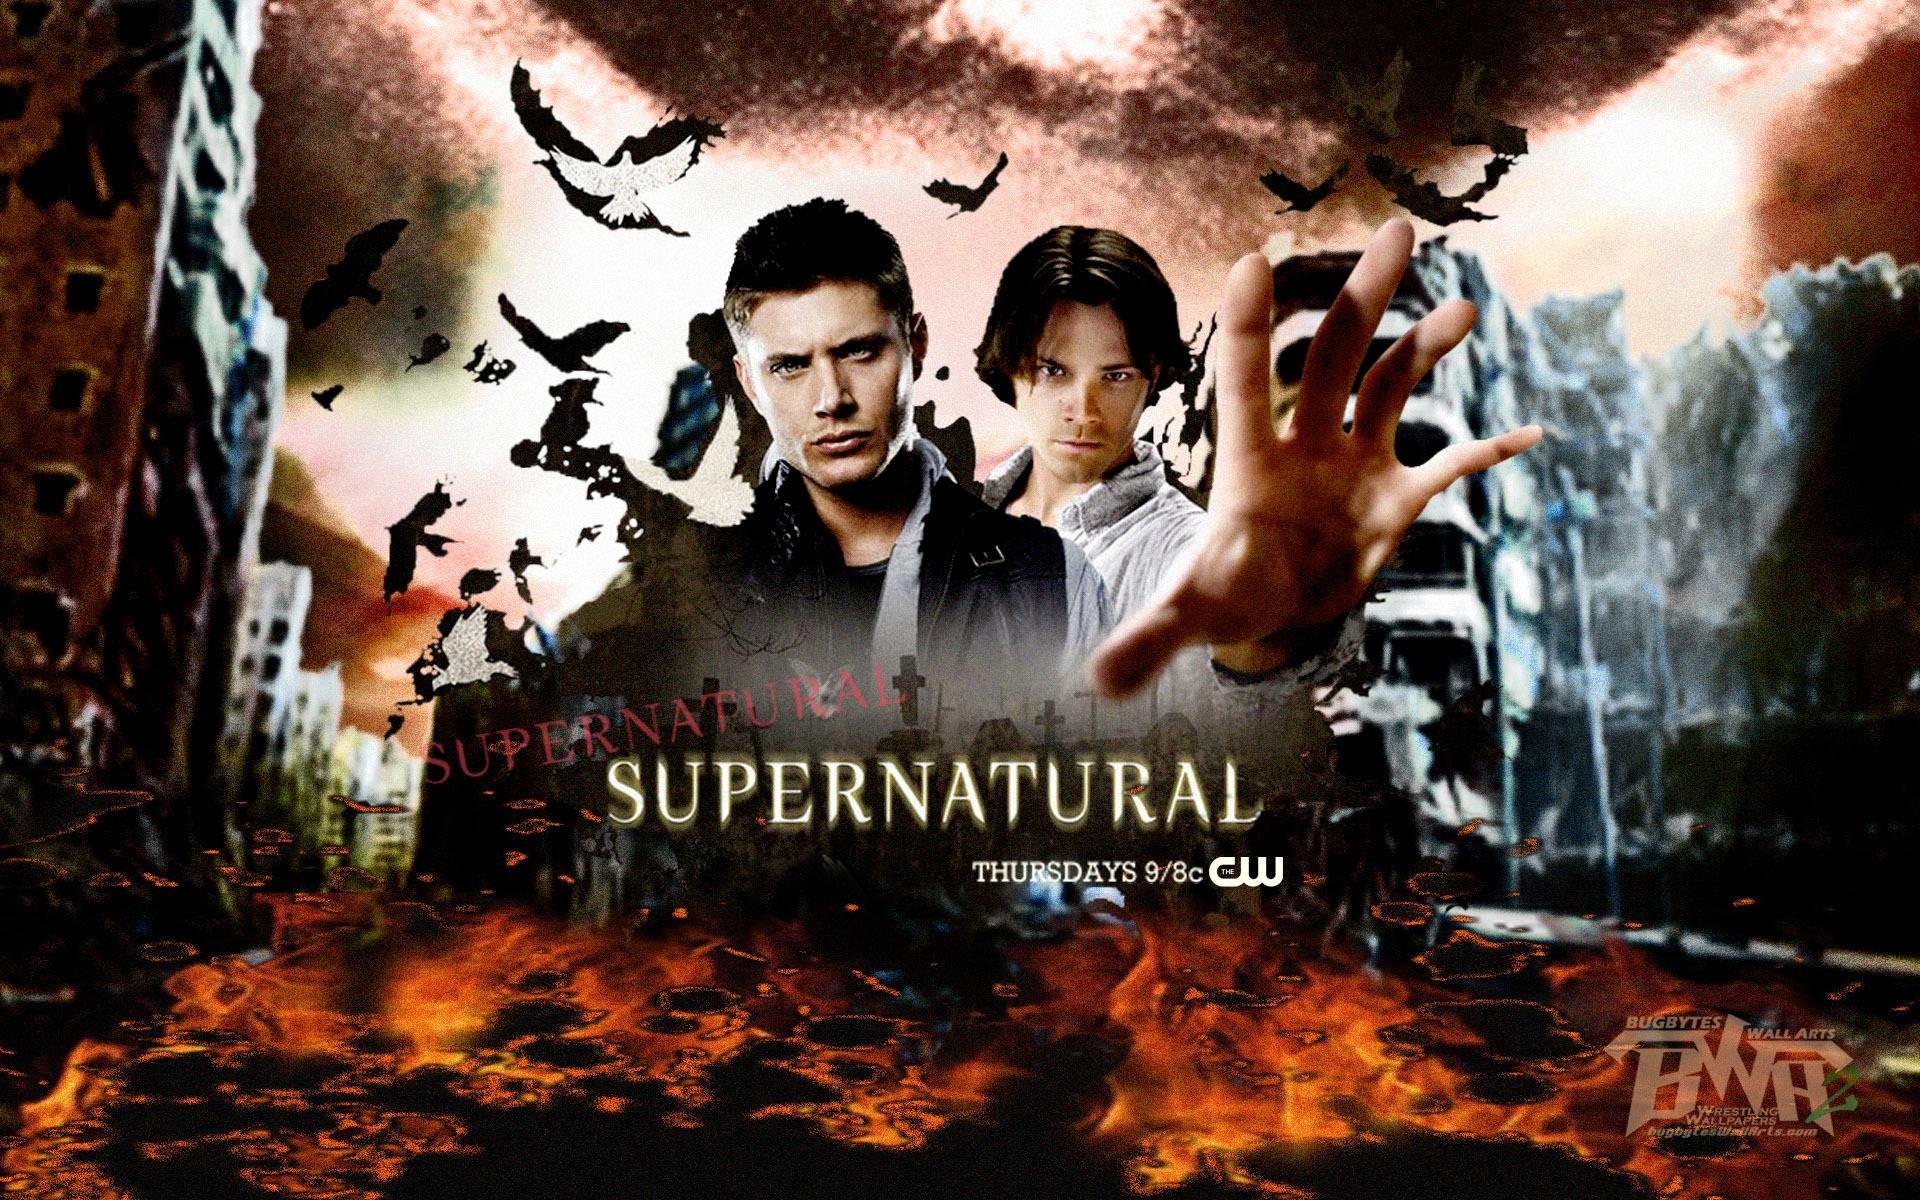 Supernatural wallpaper season 5 1920x1200 supernatural wallpaper season 5 1447899 download voltagebd Image collections